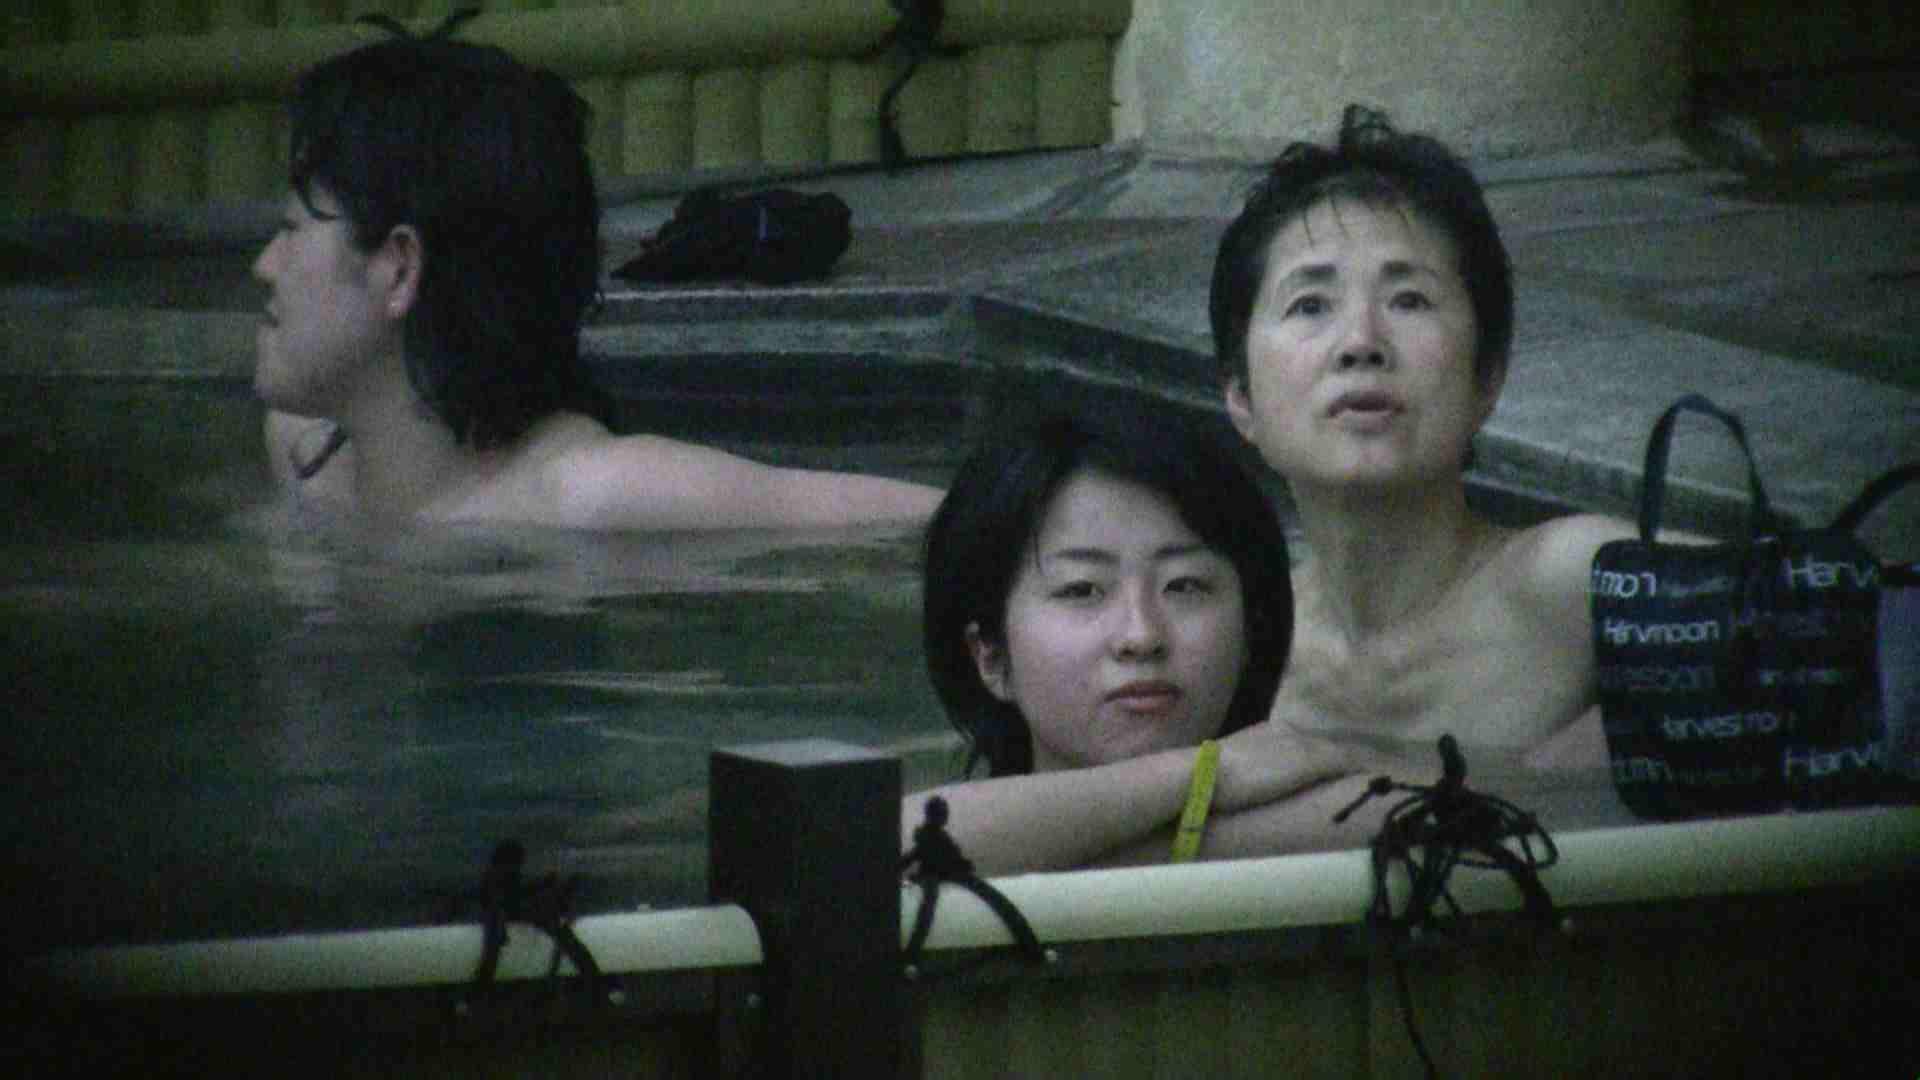 Aquaな露天風呂Vol.112 盗撮 AV無料動画キャプチャ 26PICs 11